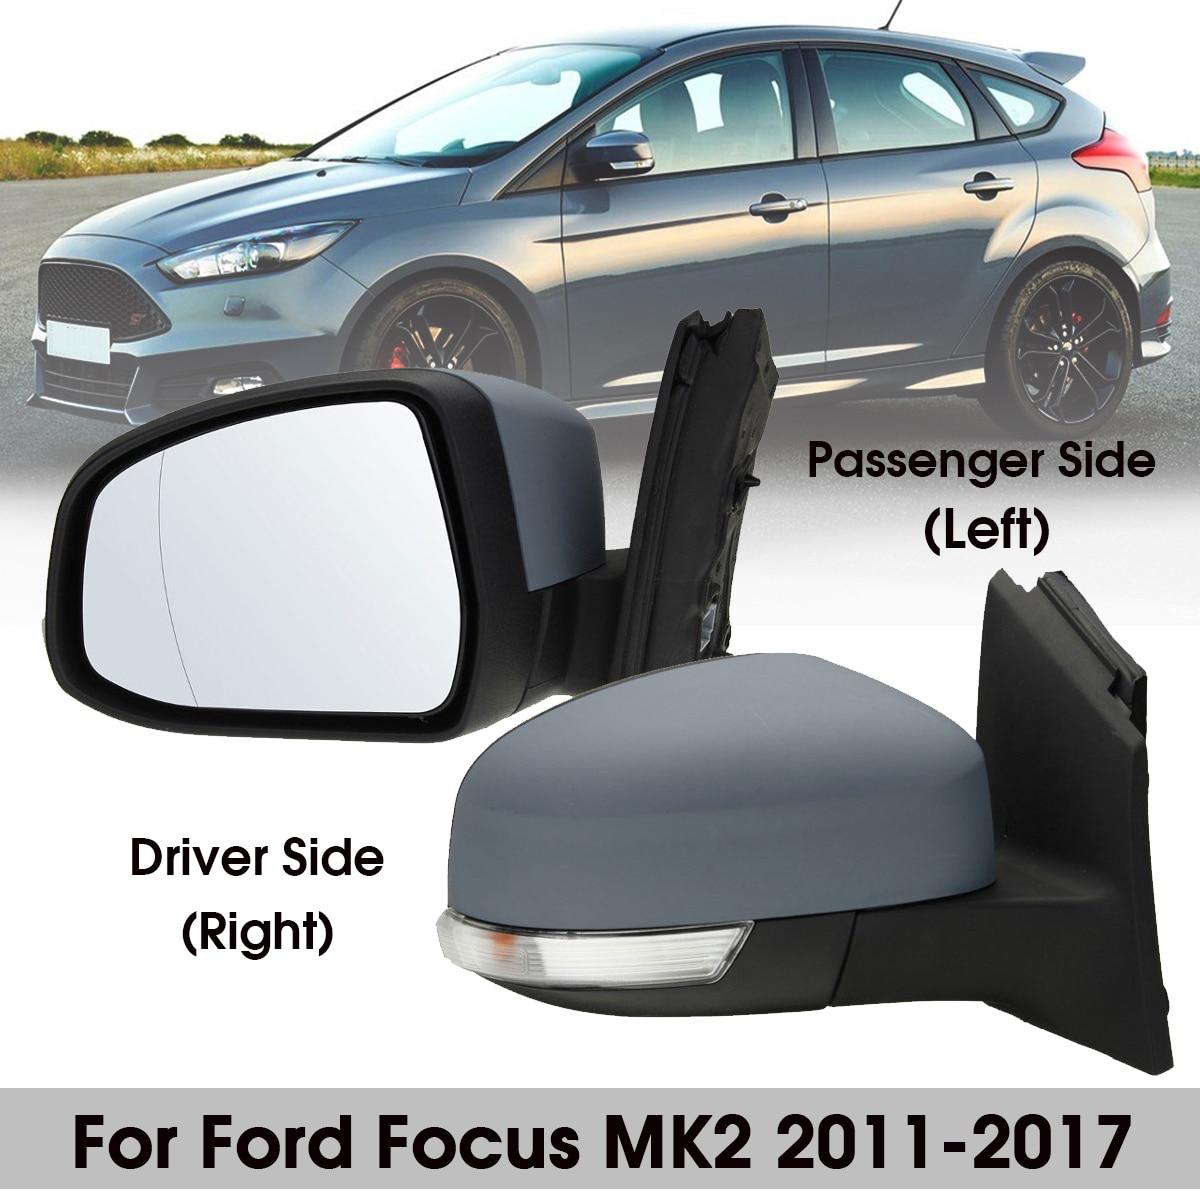 FOR FORD FOCUS MK3 2011-2018 NEW DOOR MIRROR BLACK COVER CAP LEFT N//S